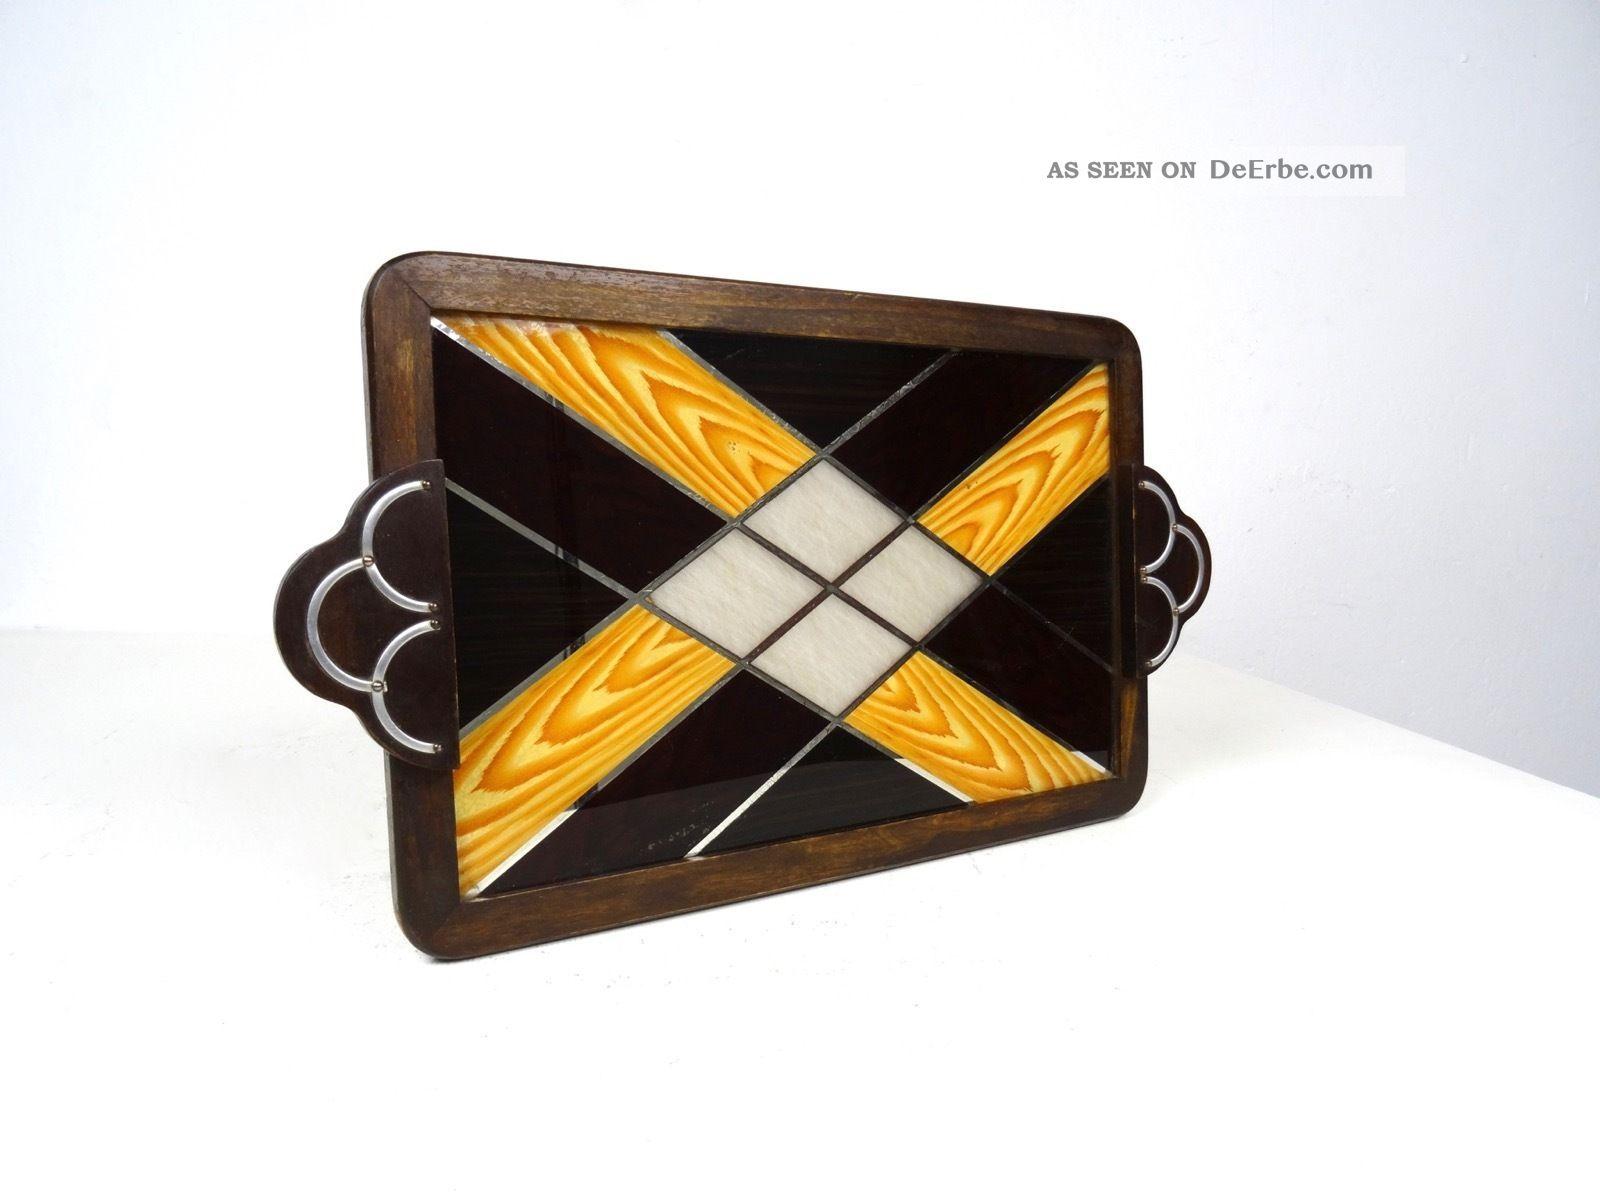 Extravagantes Art Deco Servier Tablett 1930 Tablett Bar Geometrisch Chrom 1920-1949, Art Déco Bild